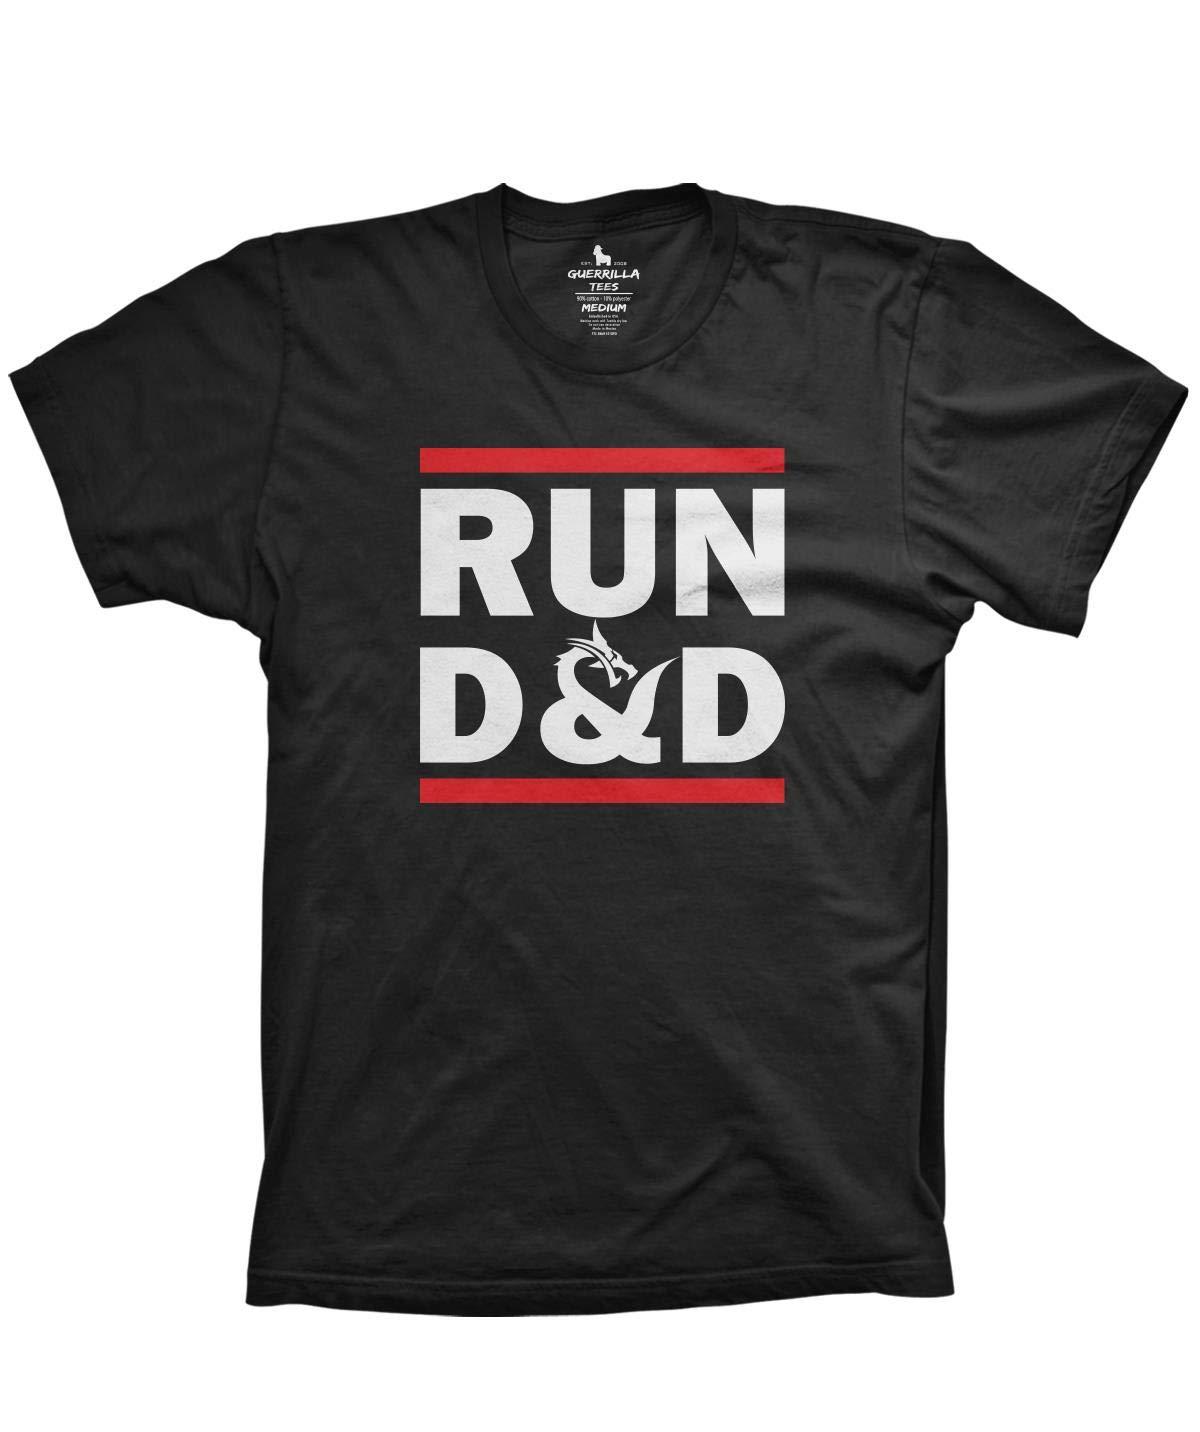 Run D D Shirt Funny Tshirts Board Game Dice Shirt